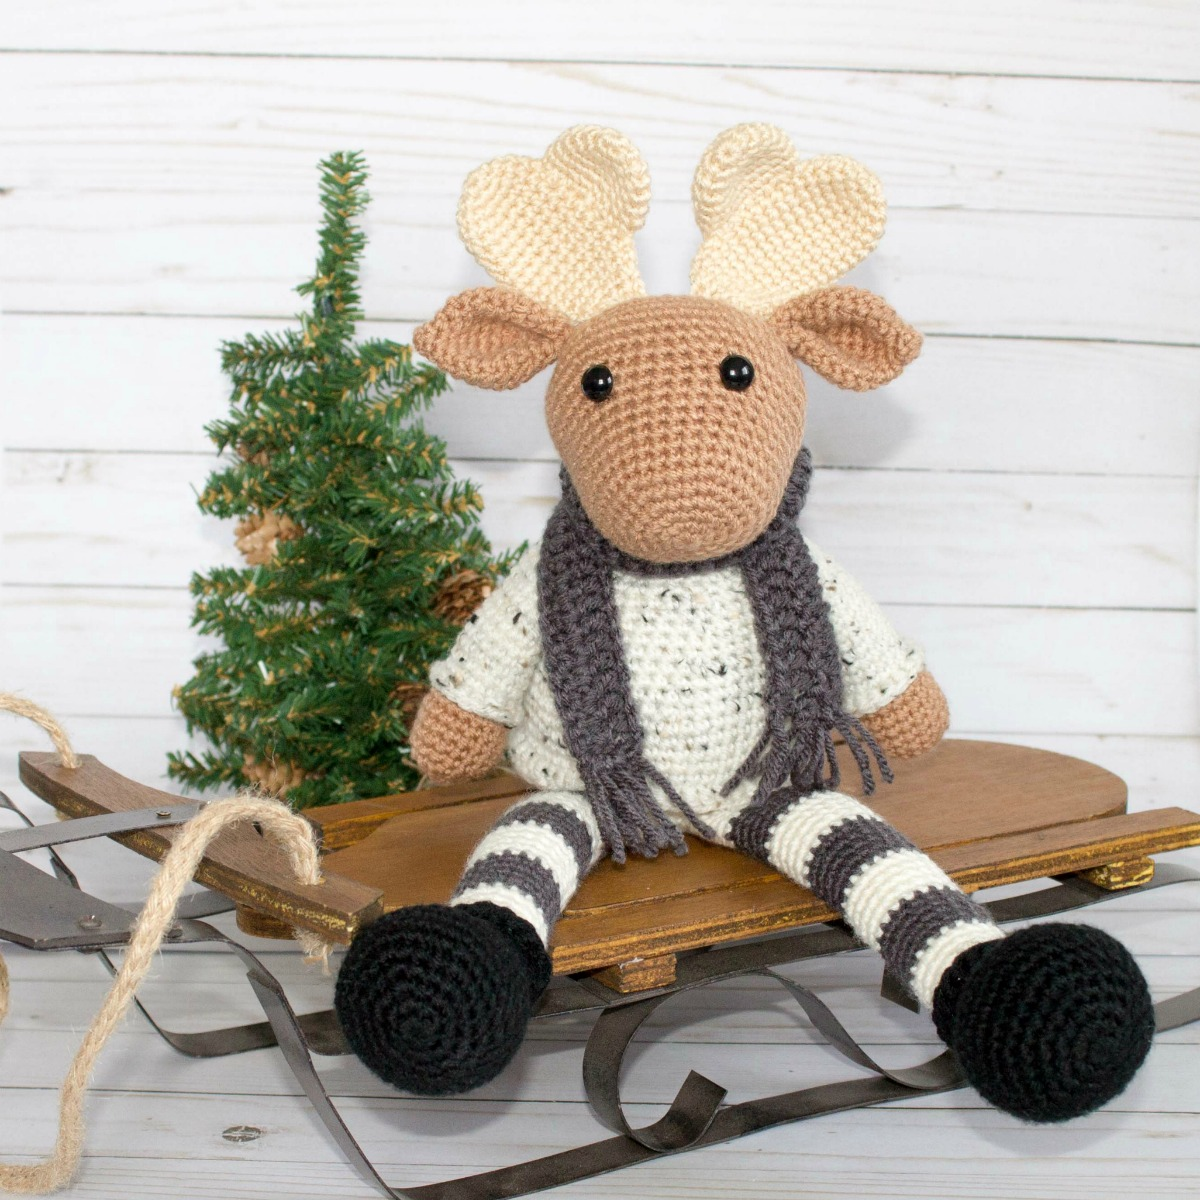 Free Crochet Moose and Crochet Reindeer Pattern - thefriendlyredfox.com